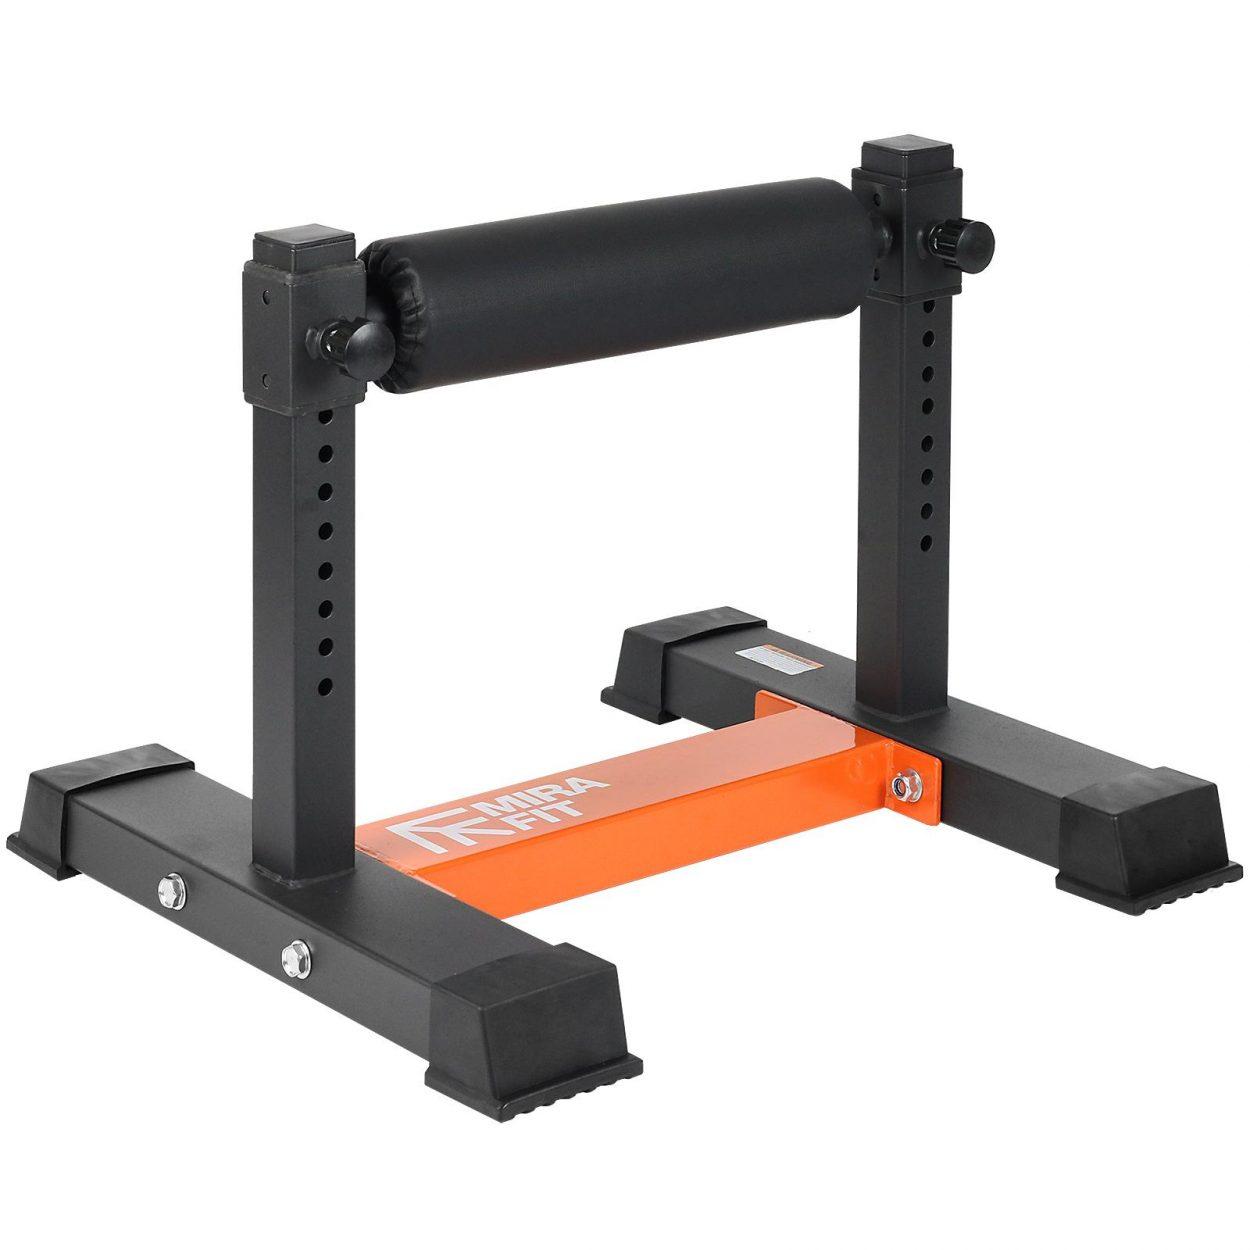 Mirafit Single Leg Split Squat Stand – Fully Adjustable